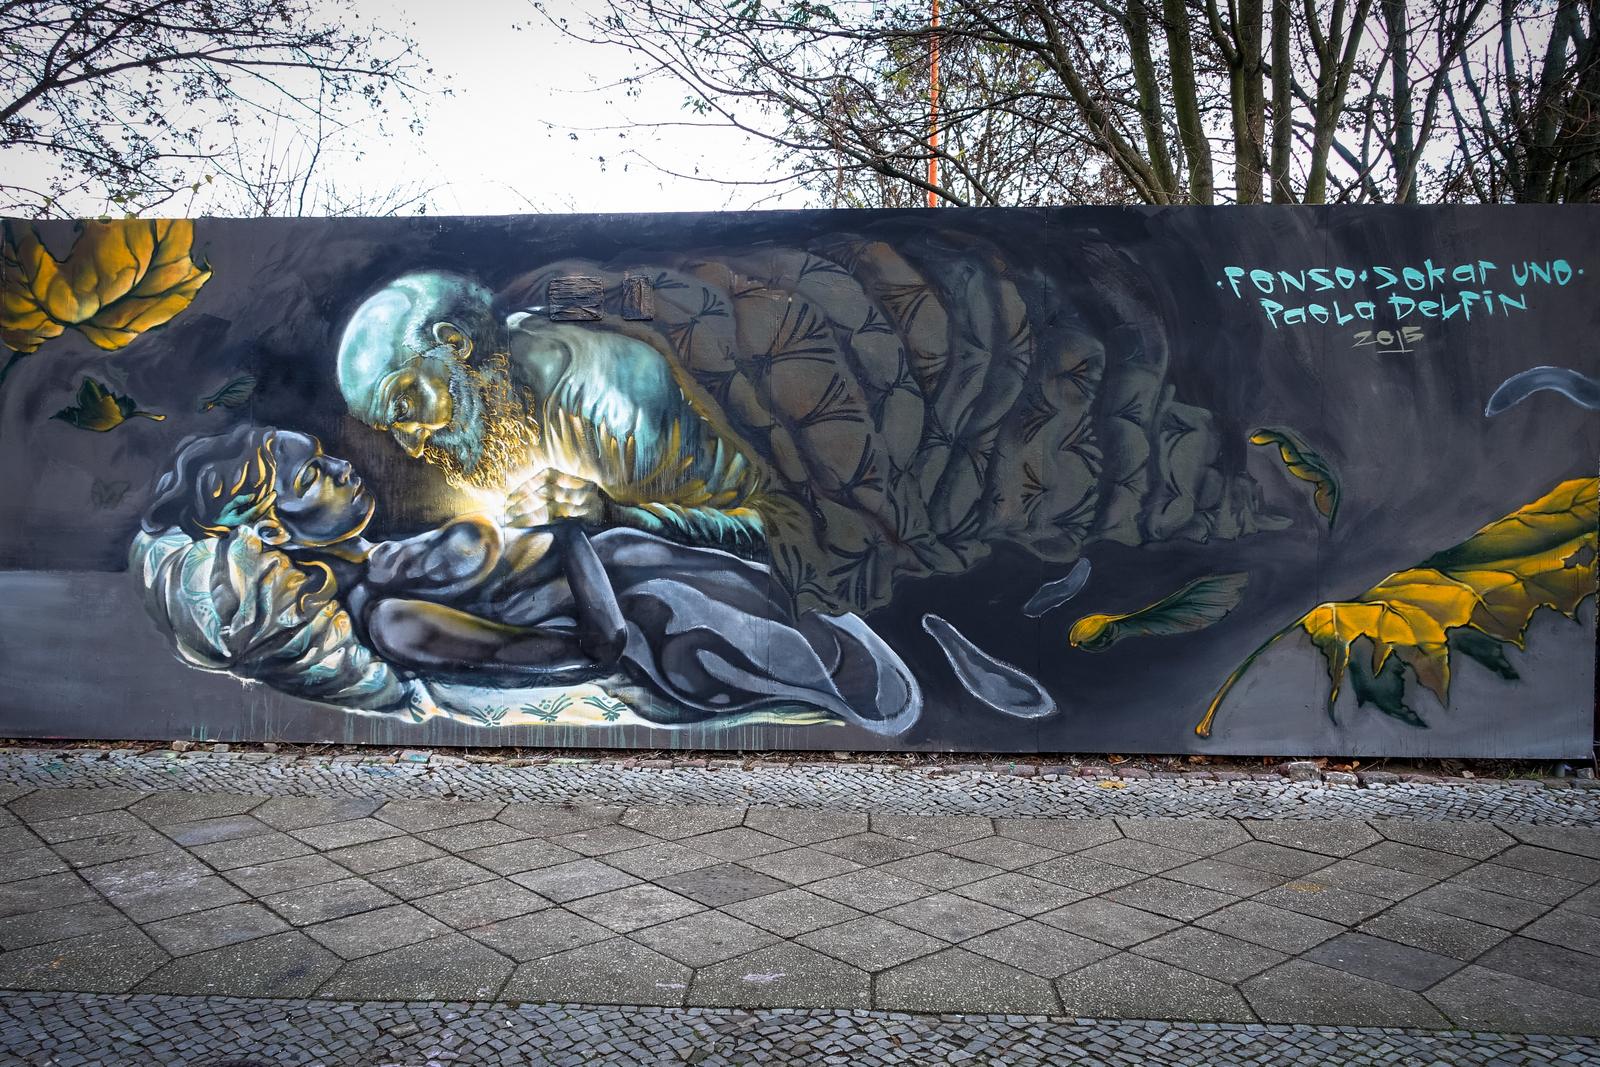 mural from pao delfin, sokar uno & fonso paquidermo – berlin, neukölln